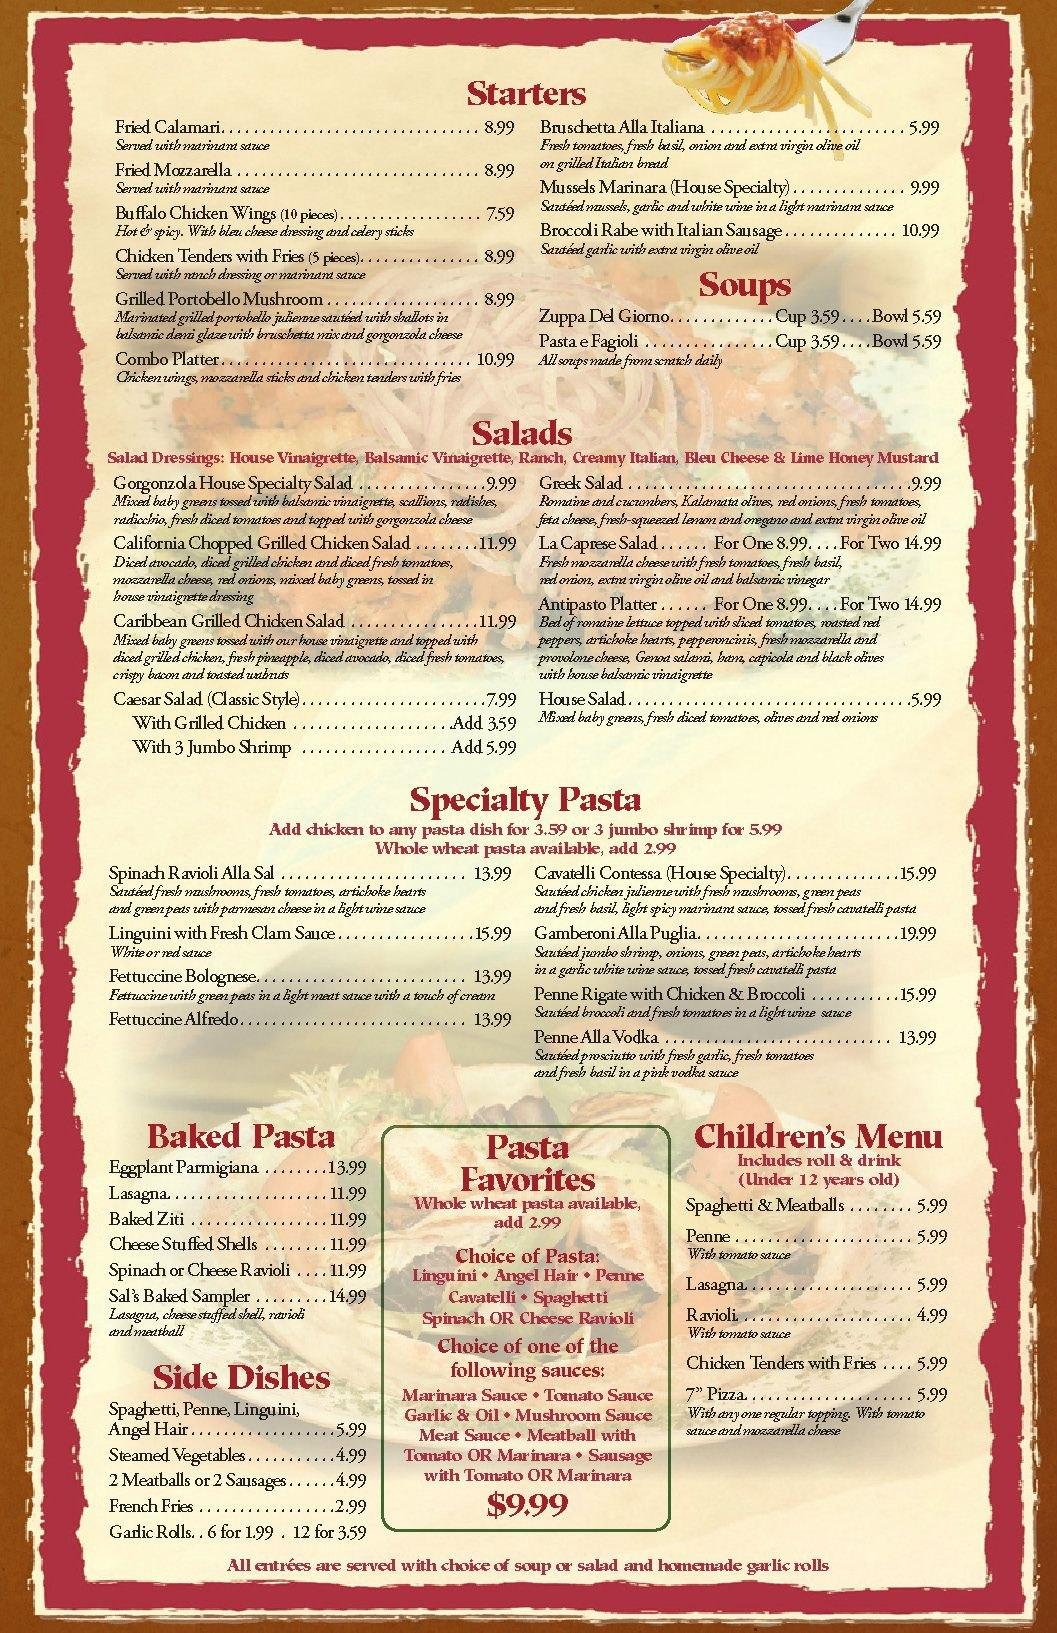 Free Blank Restaurant Menu Templates  Restaurant Menu Templates For 50S Diner Menu Template